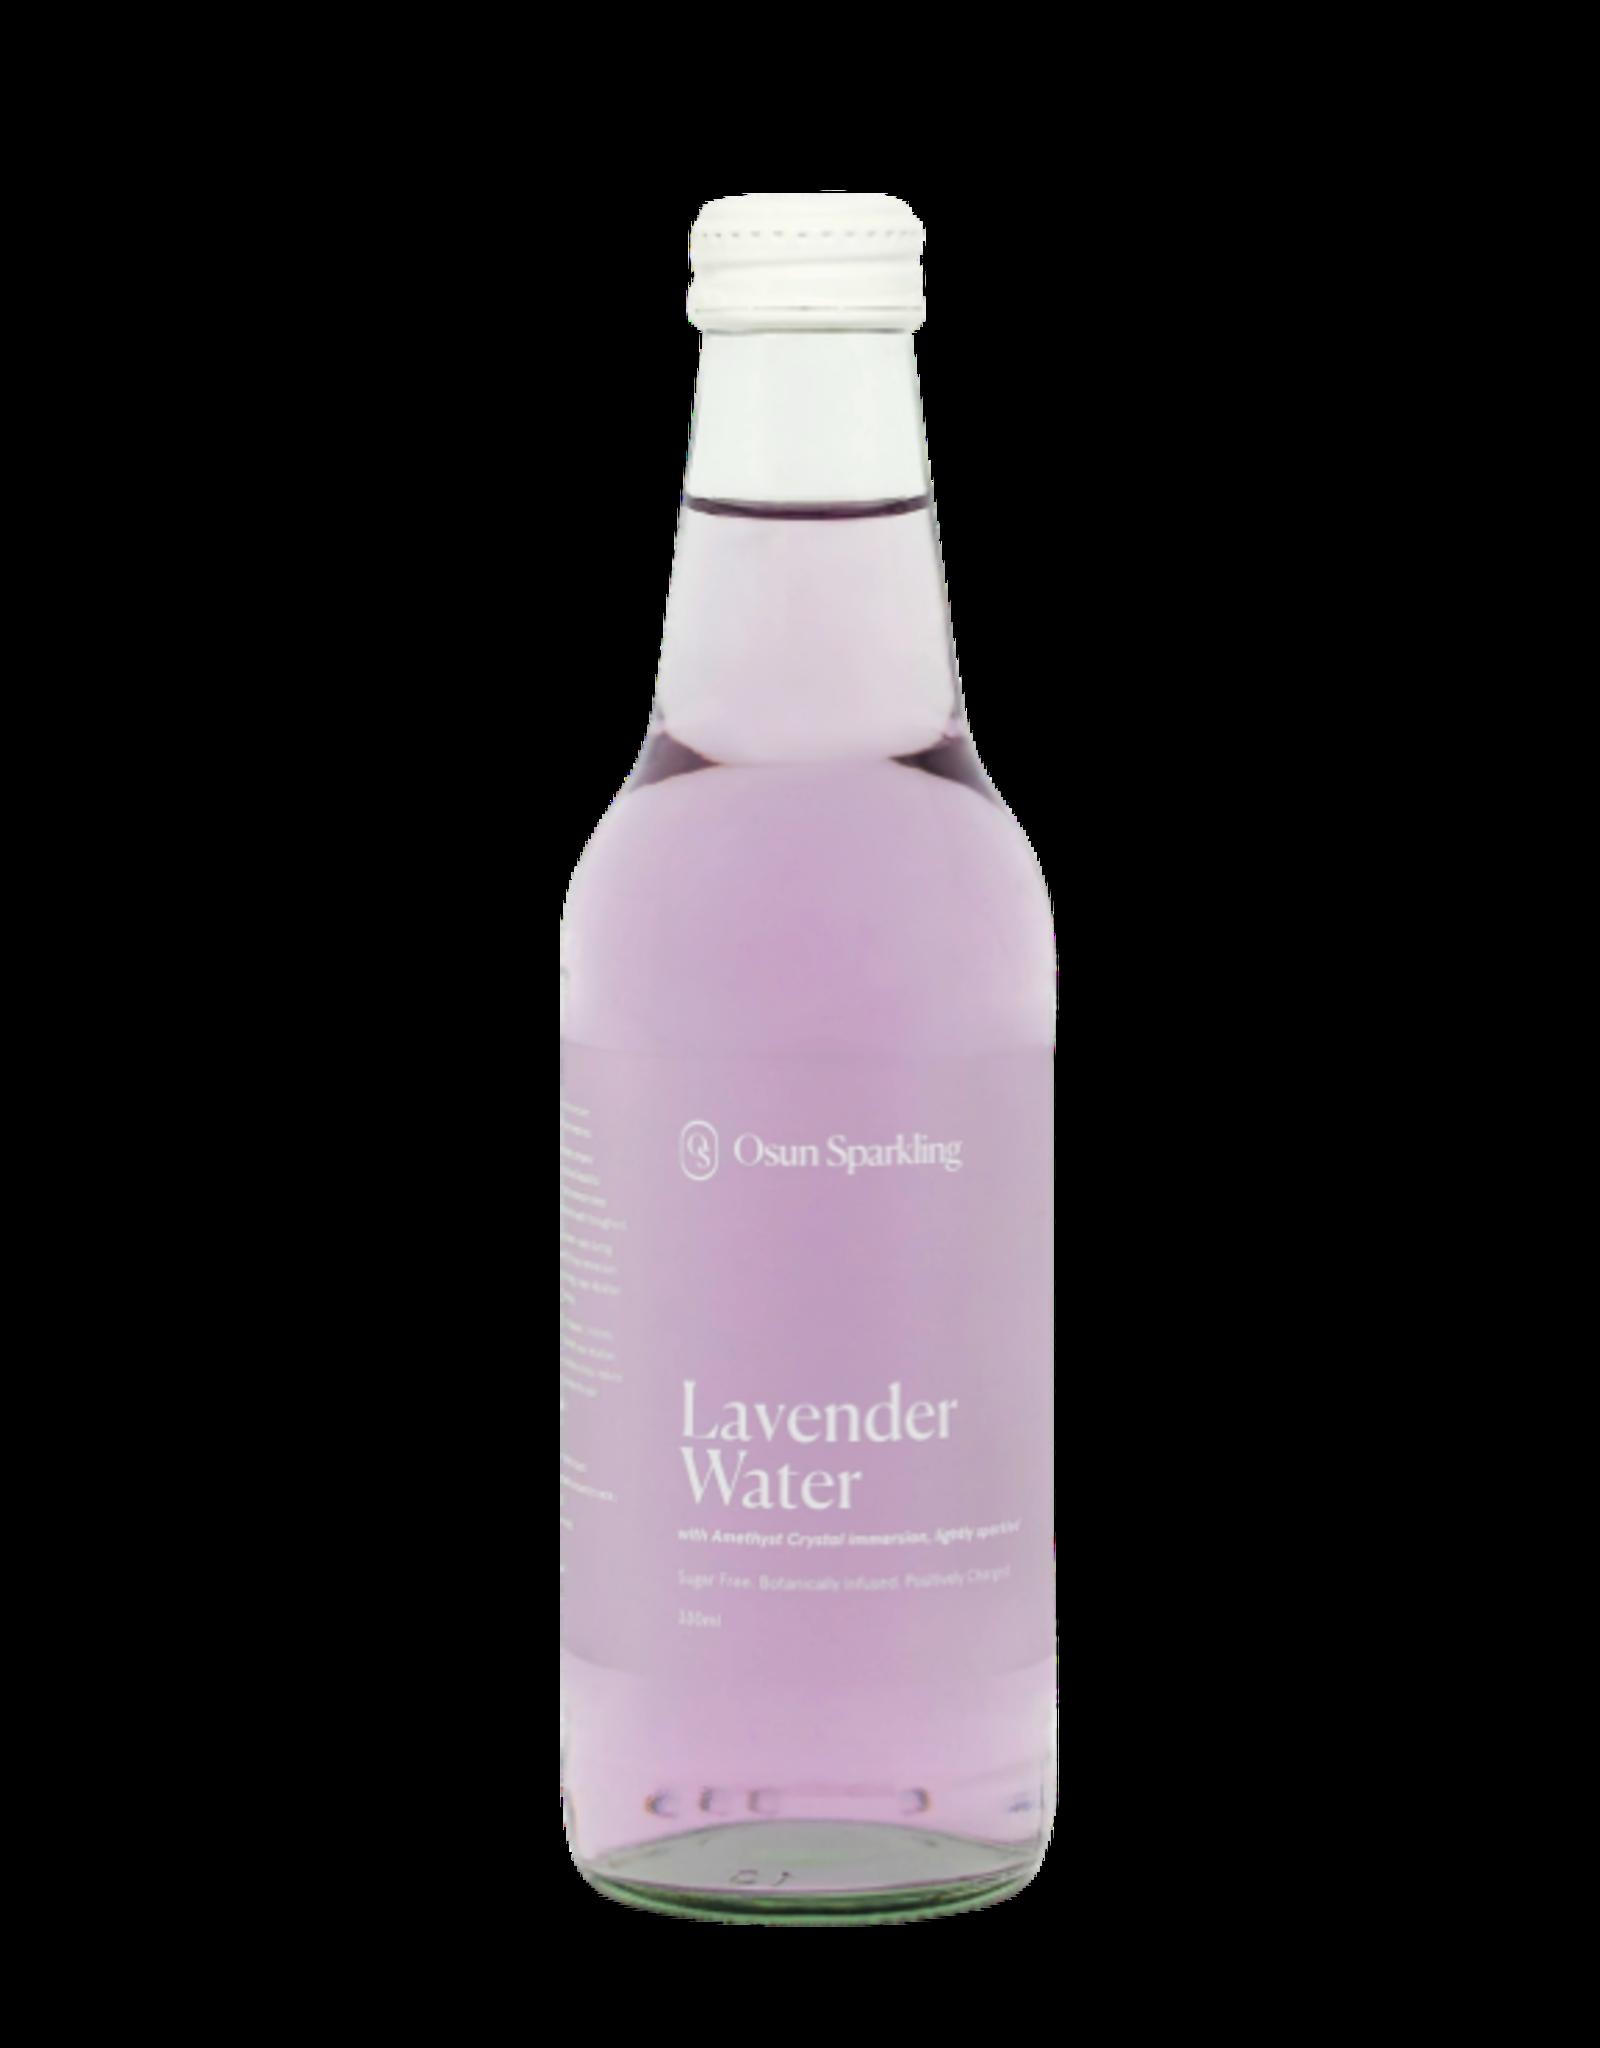 Osun Sparkling Lavender Sparkling Water 330ml